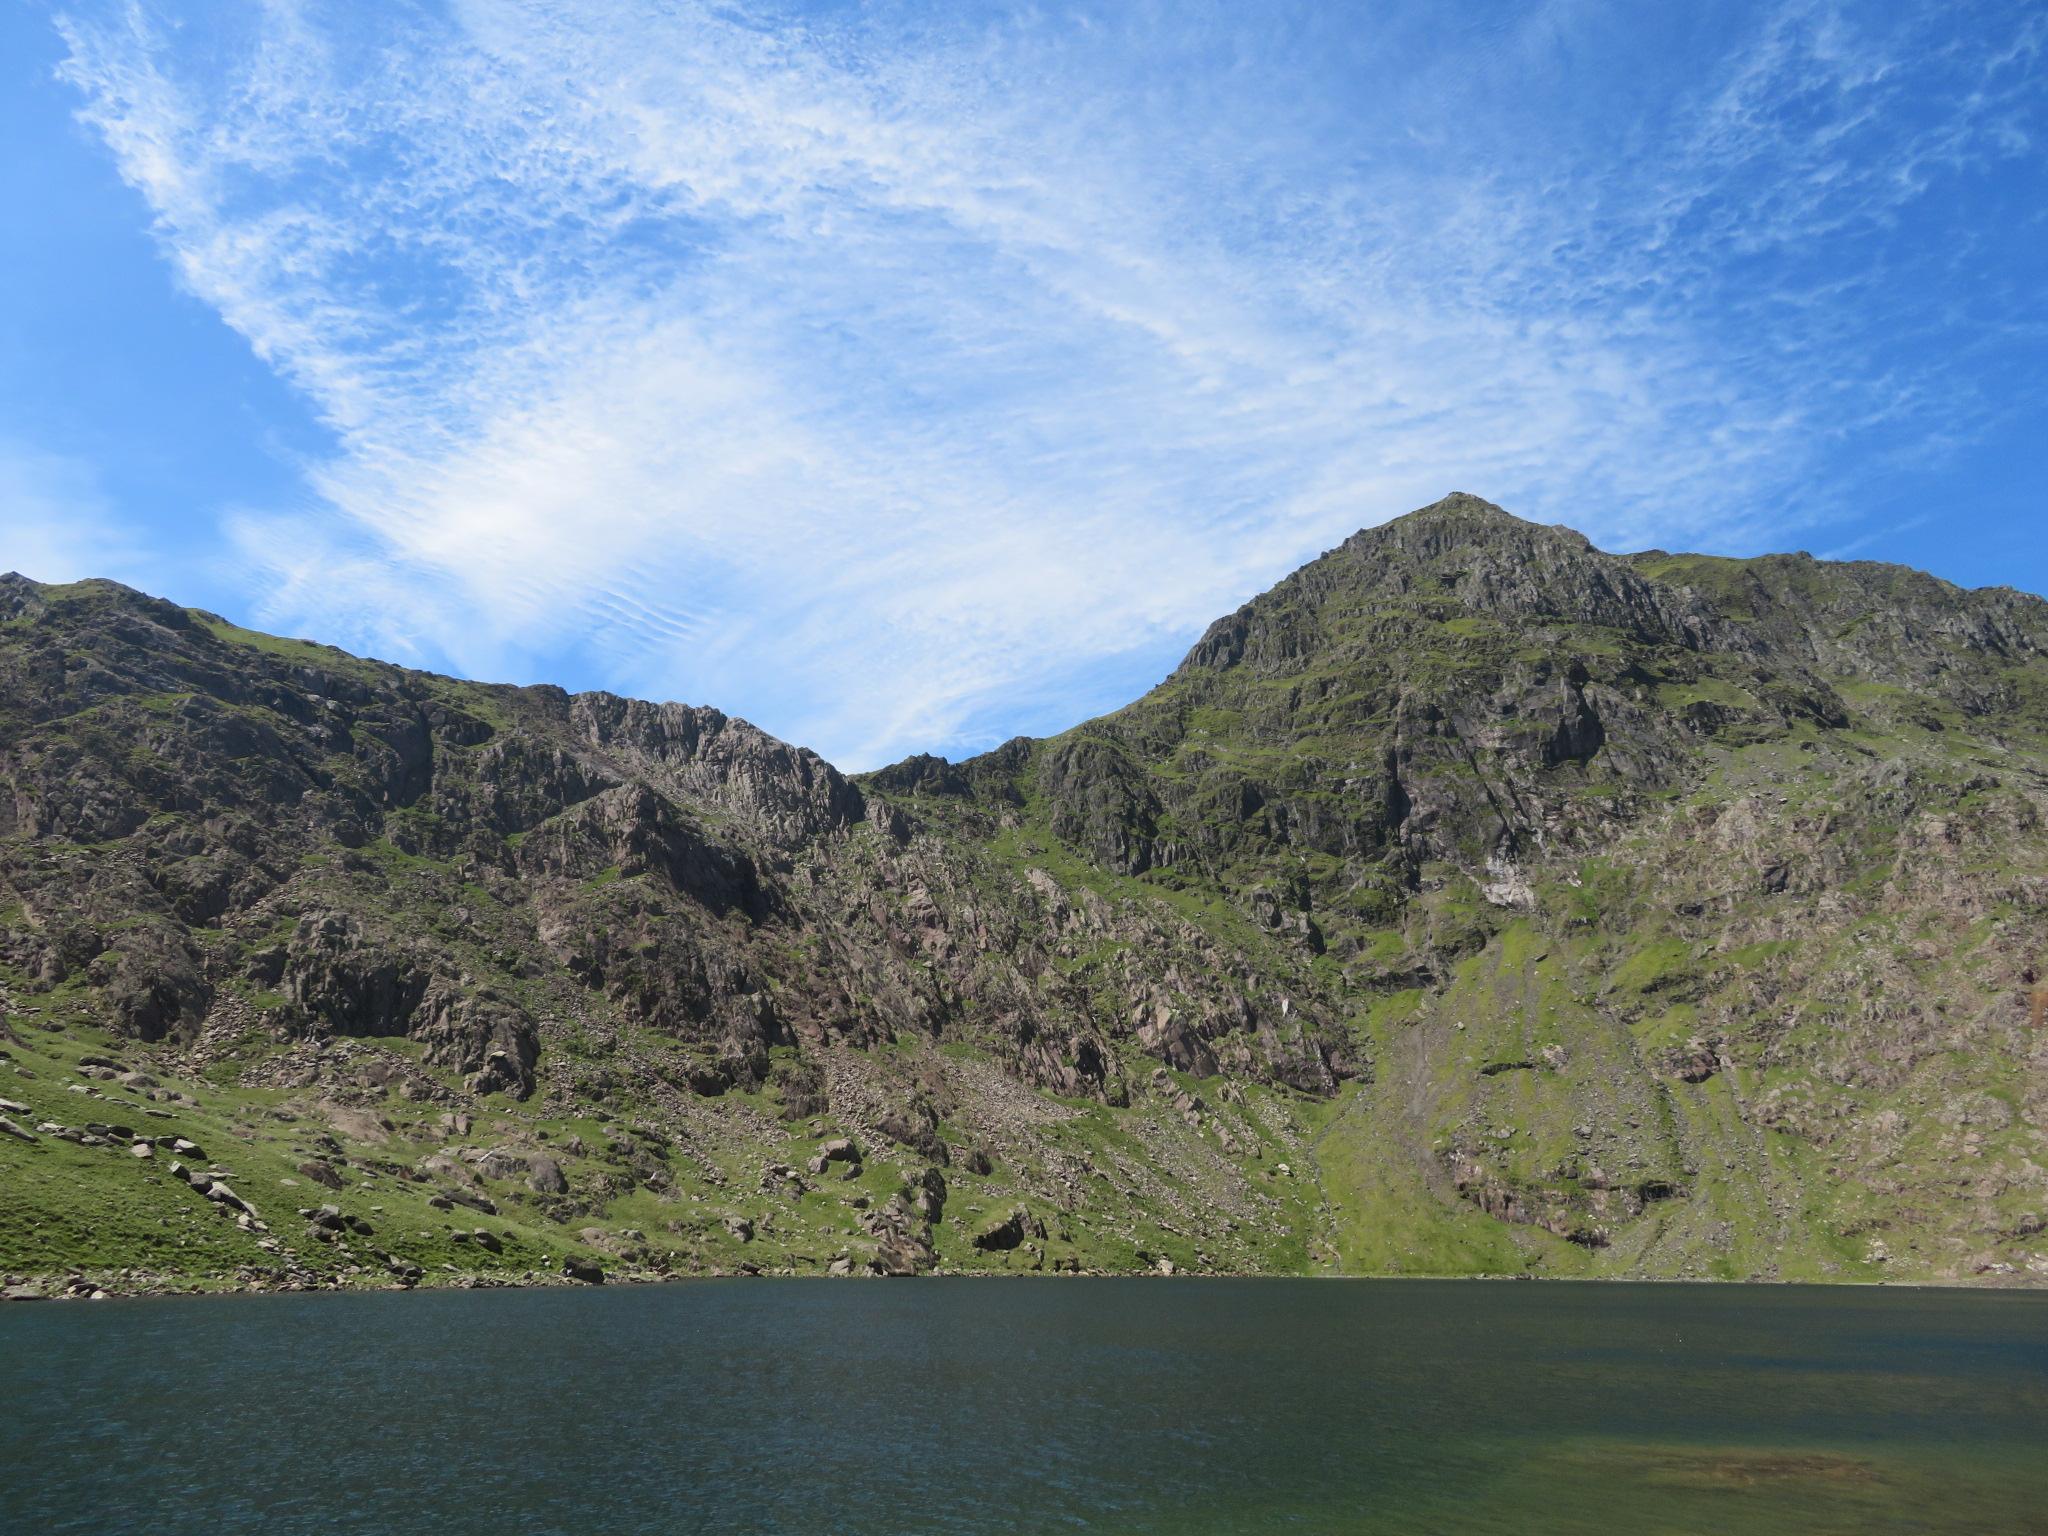 United Kingdom Wales Snowdonia, Snowdon Horseshoe,  Upper tarn, Snowdon behind, Walkopedia